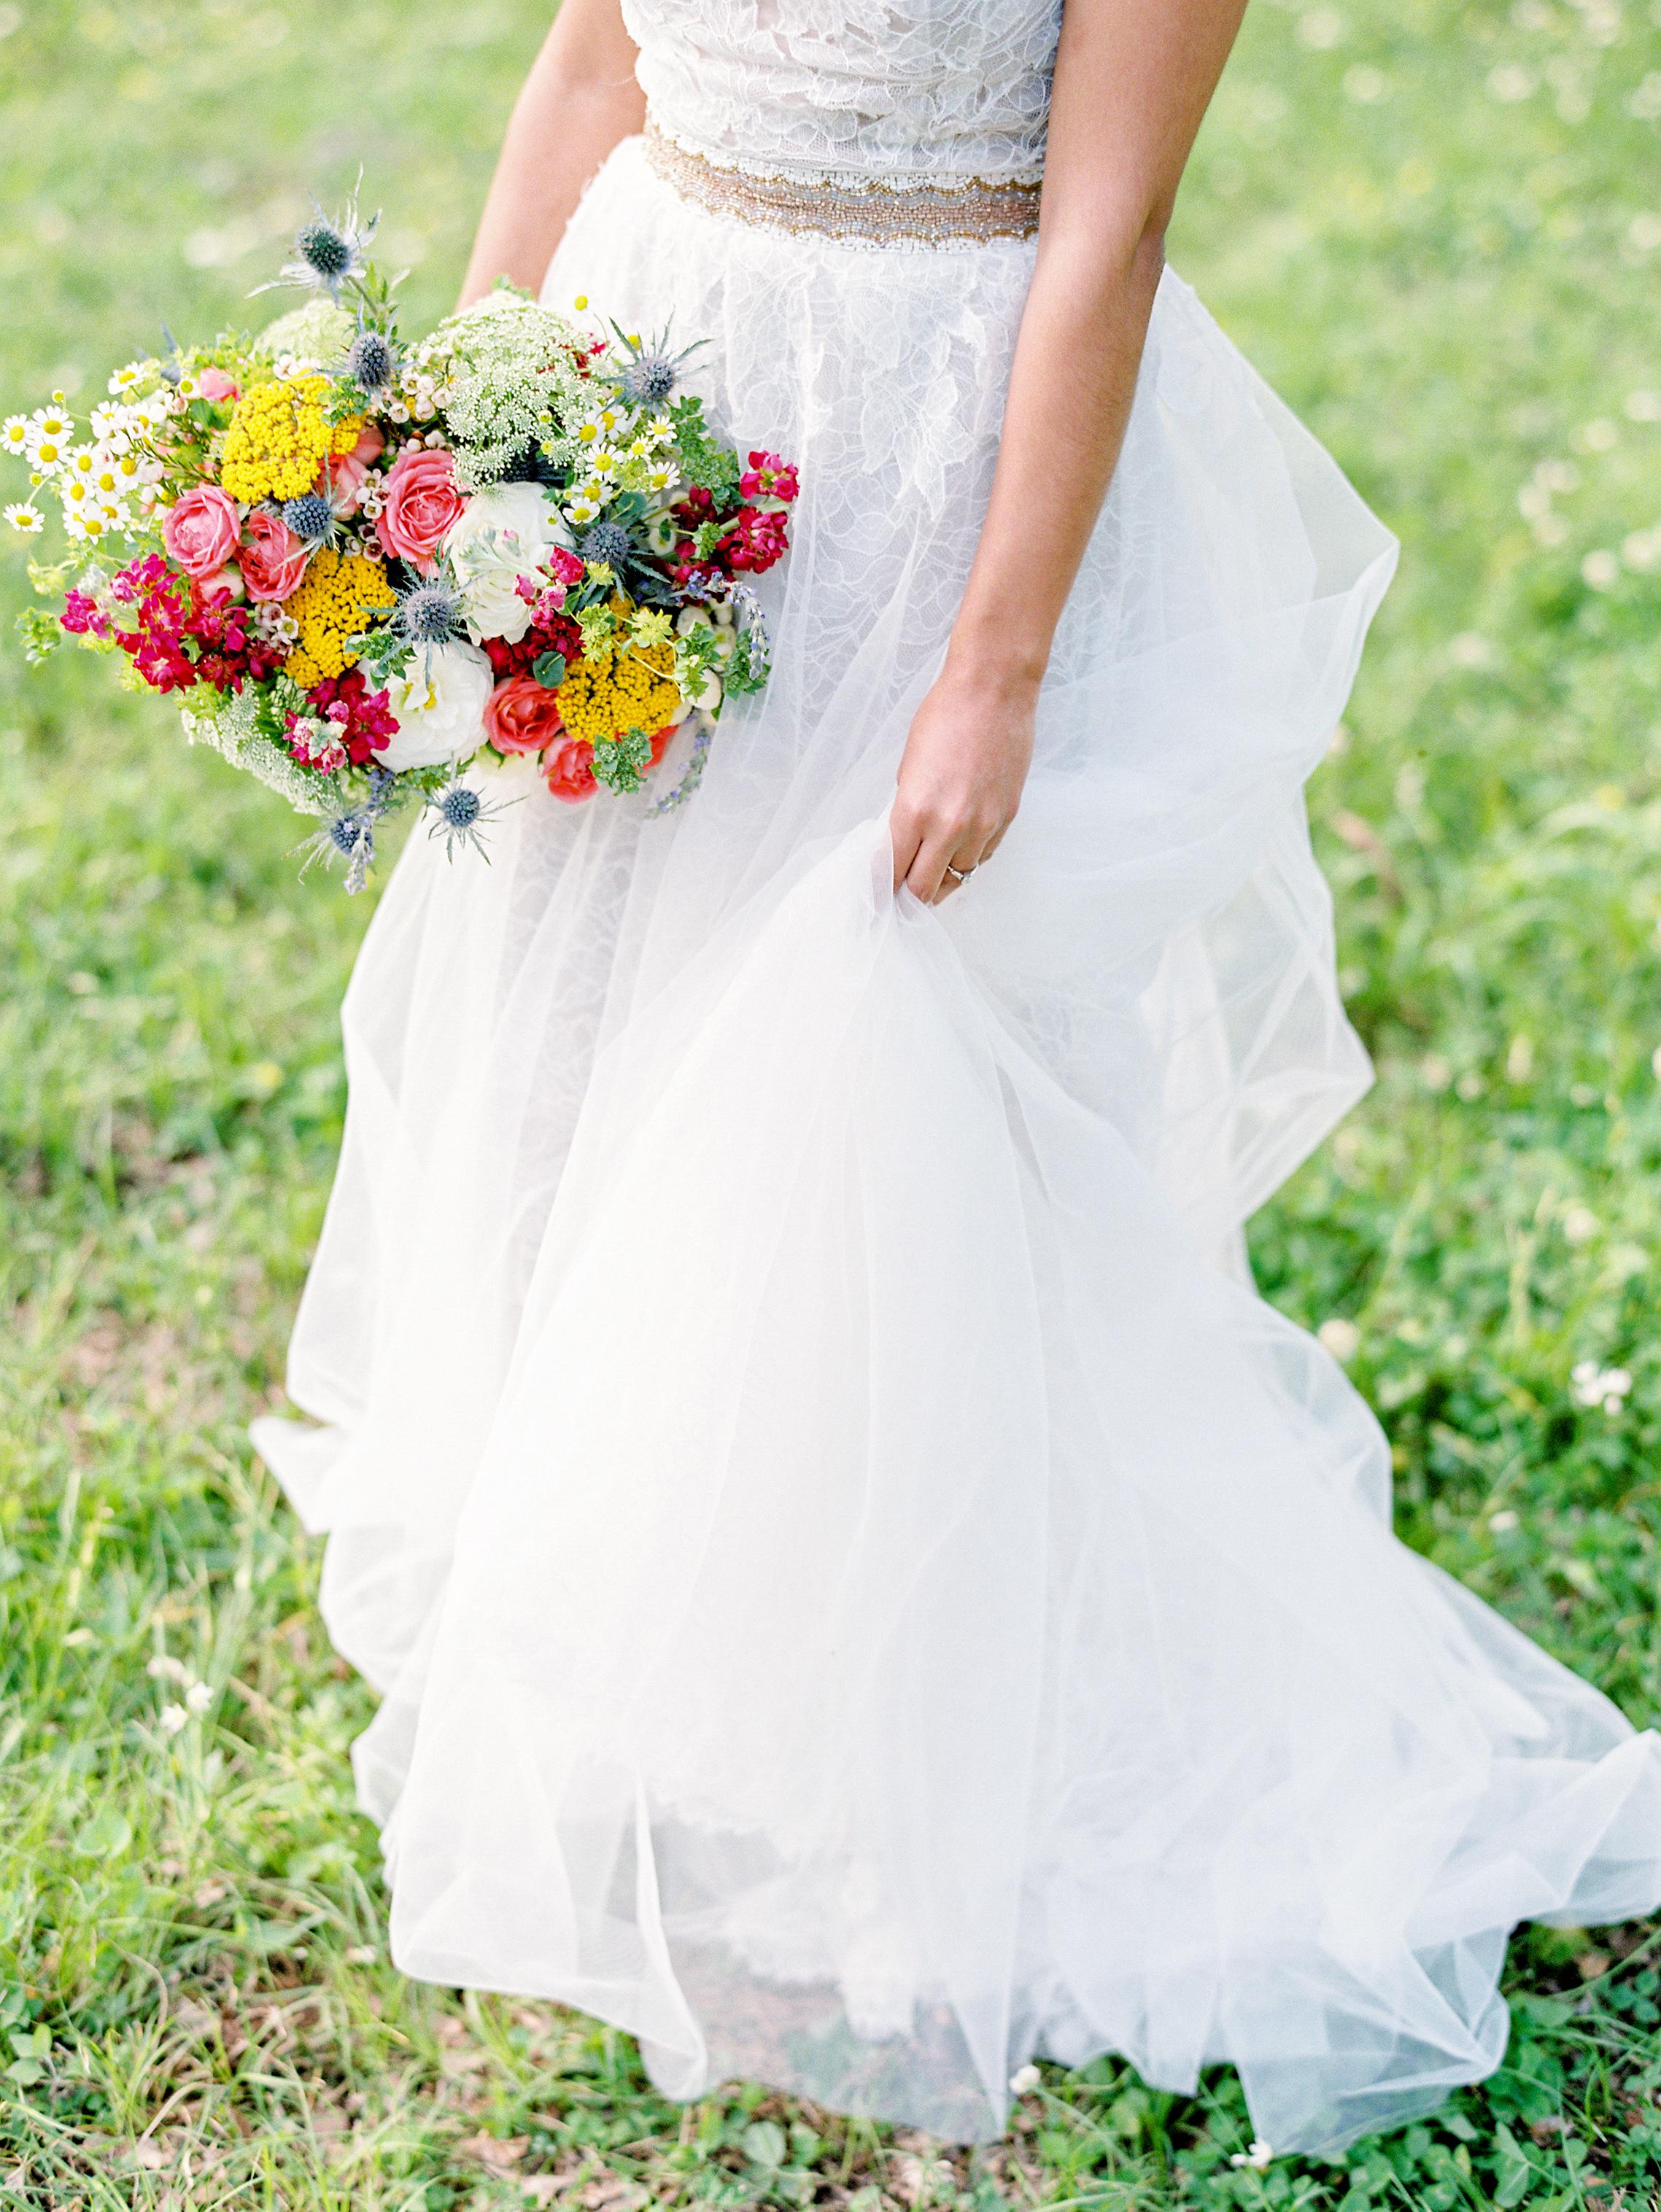 Dana Fernandez Photography Houston Film Wedding Photographer Destination Texas-7.jpg